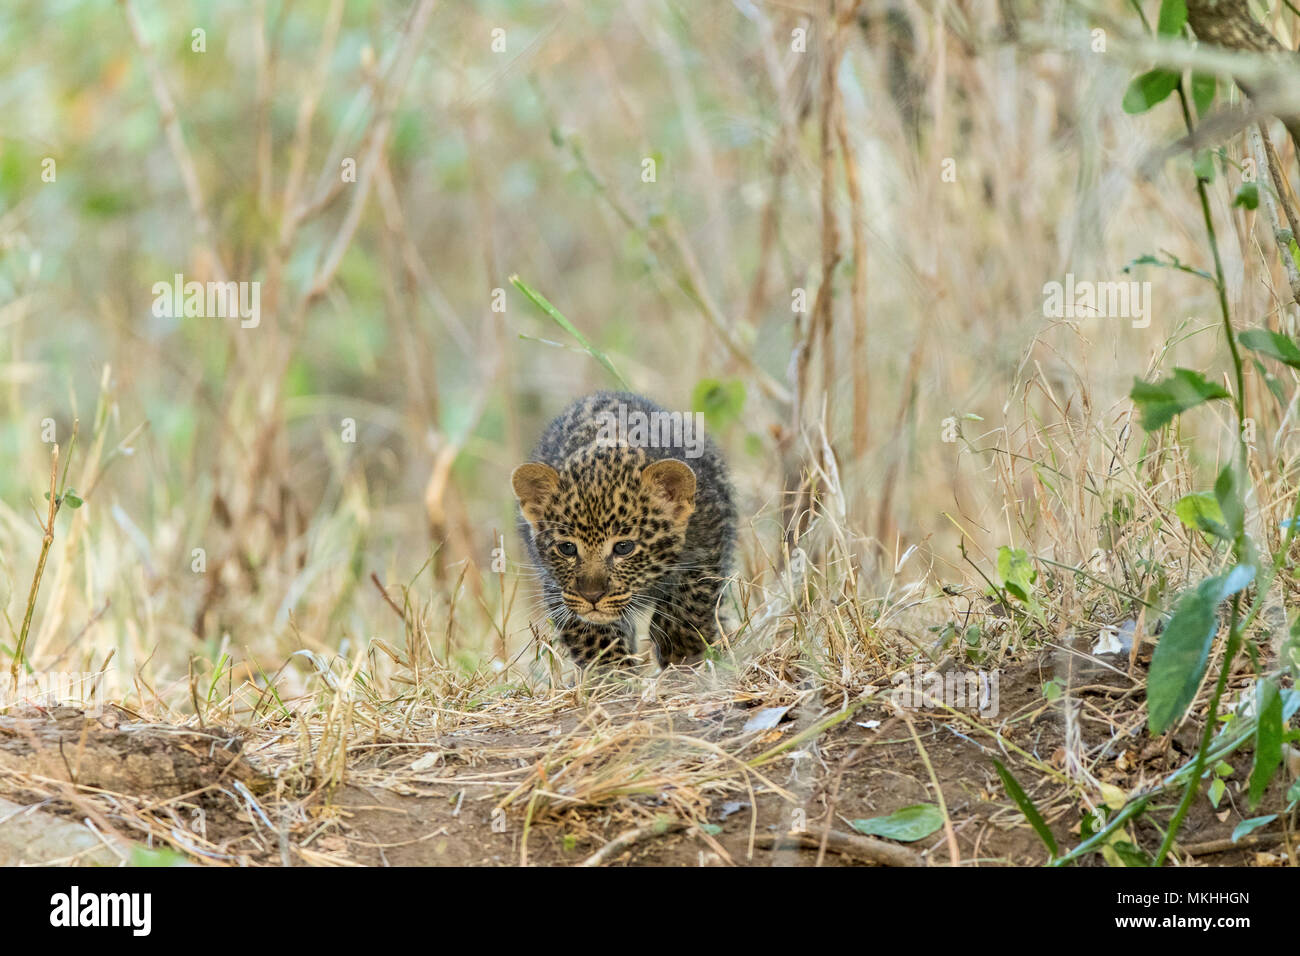 Leopard (Panthera pardus), 2 months old cub, Masai-Mara National Reserve, Kenya Stock Photo